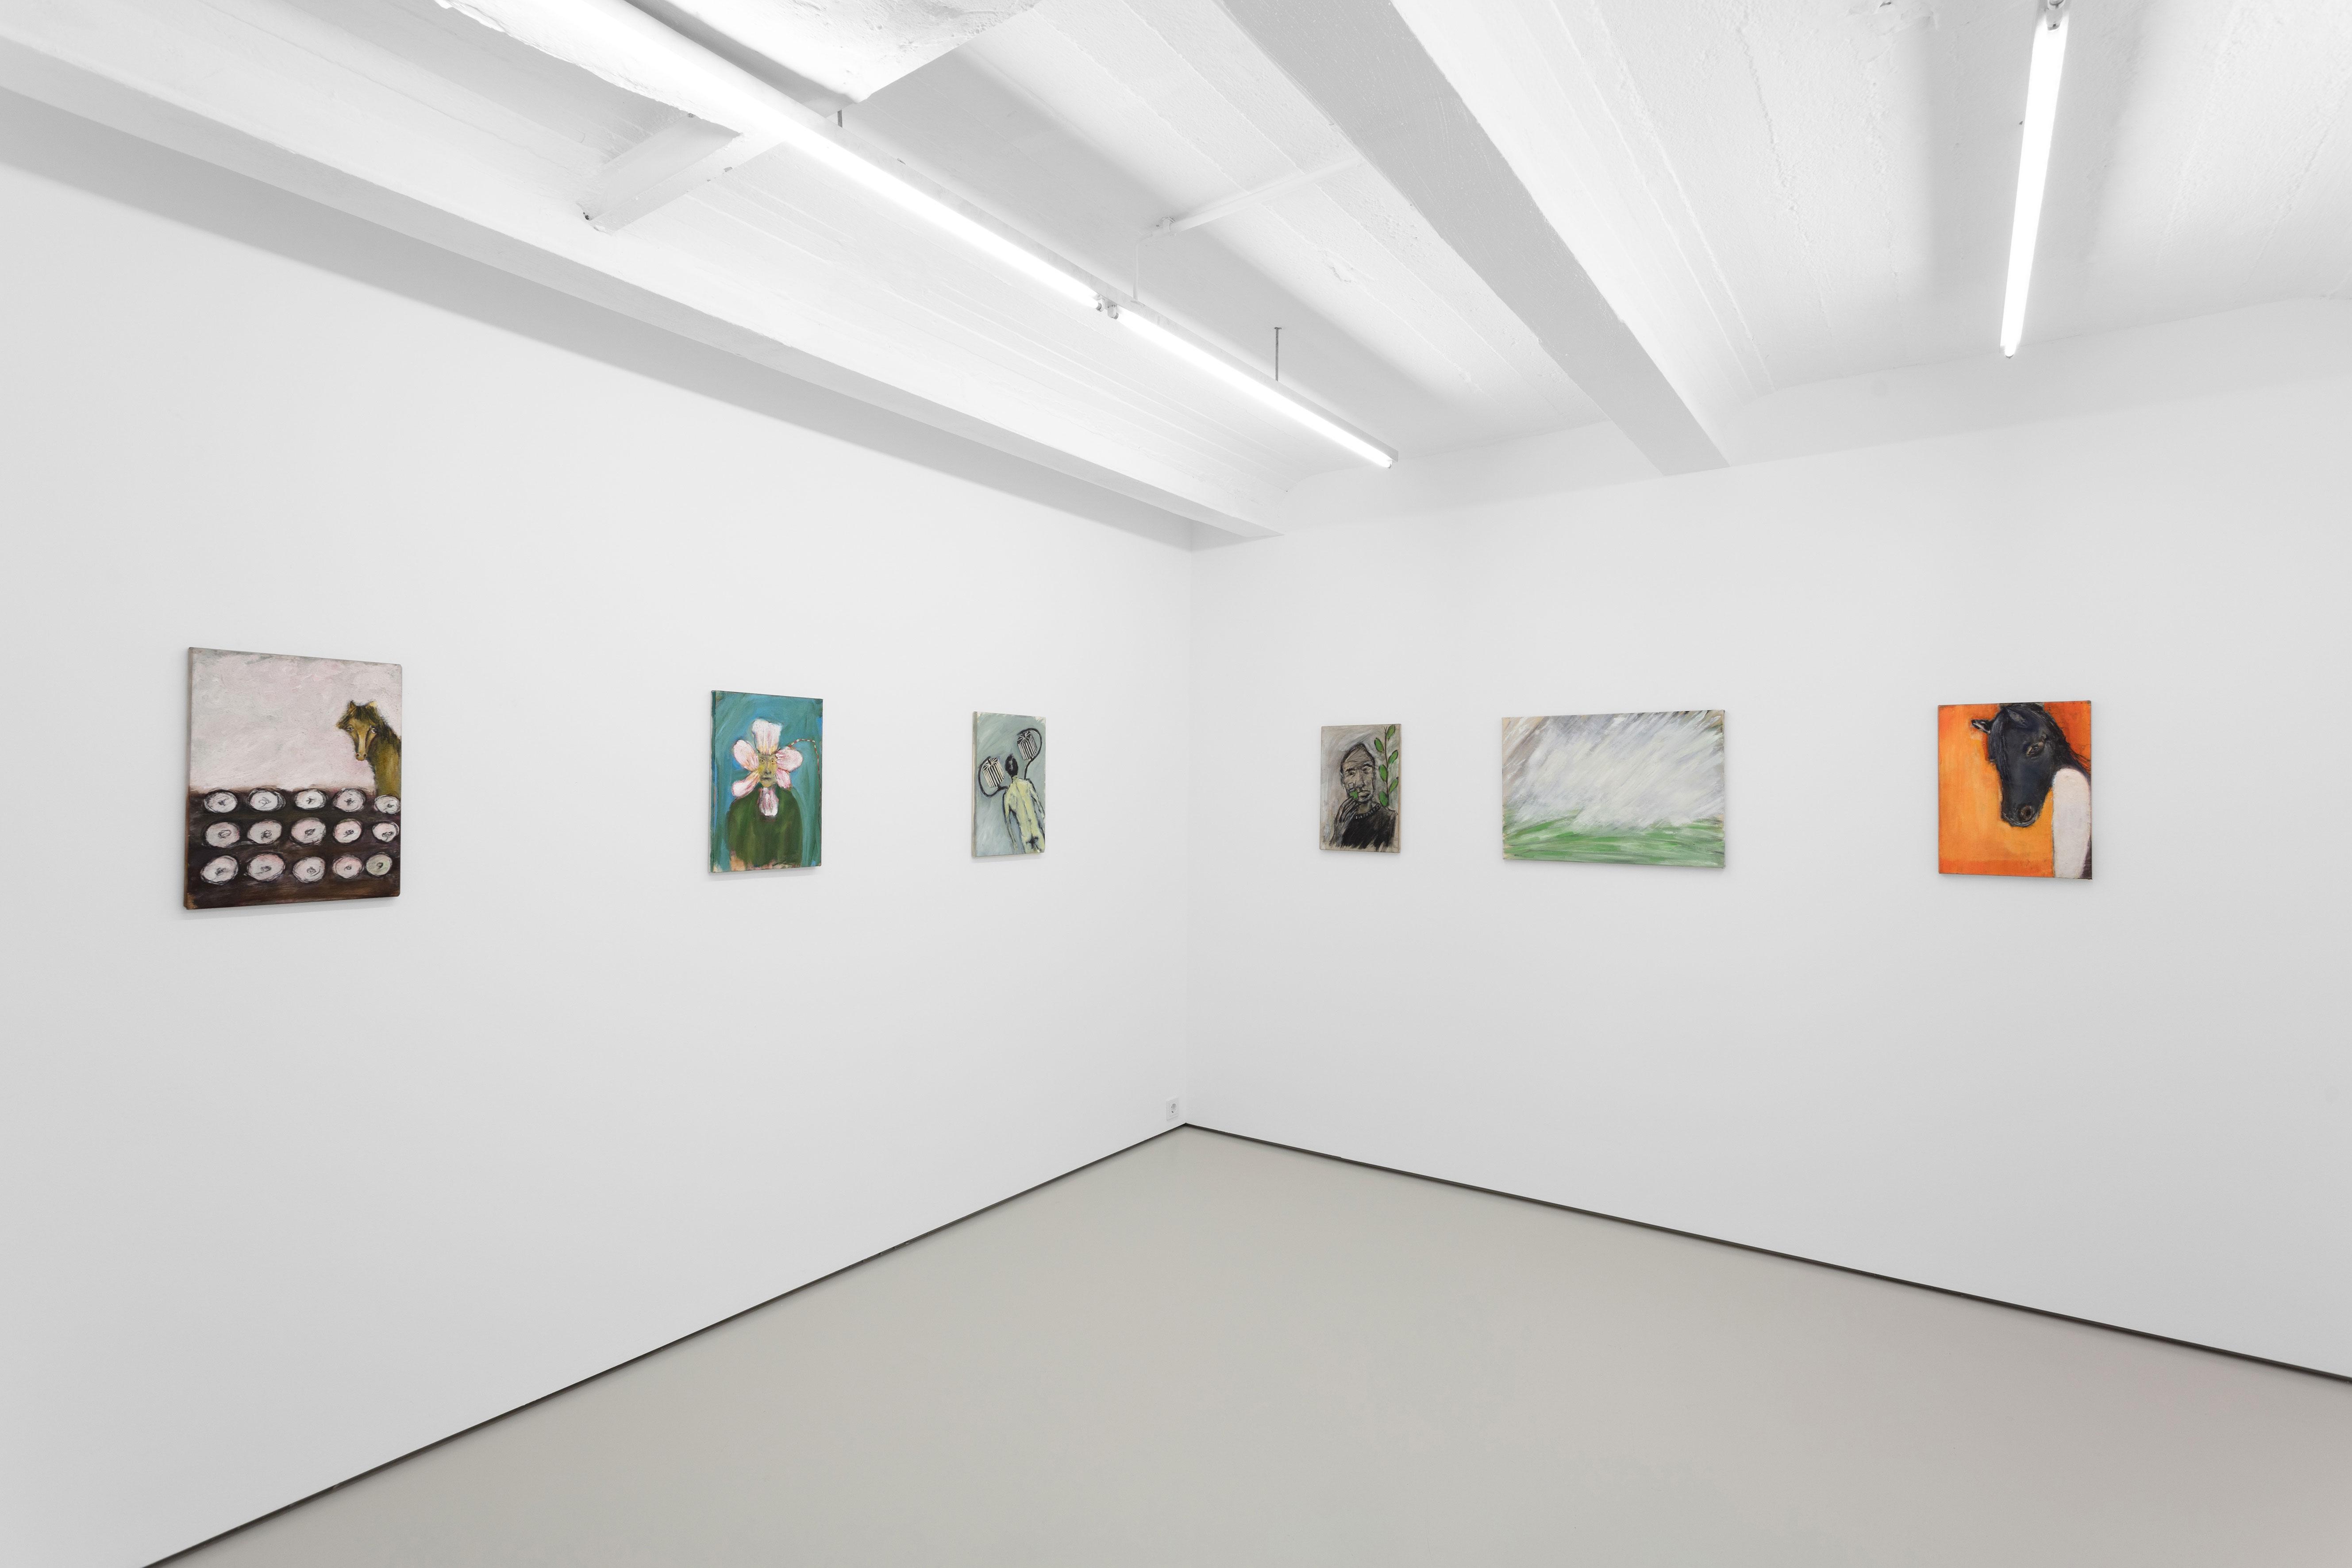 Yuri Leiderman, Ballad of Snow Falling Into the Sea, exhibition view at Gregor Podnar, Berlin, 2020. Photo: Marjorie Brunet Plaza